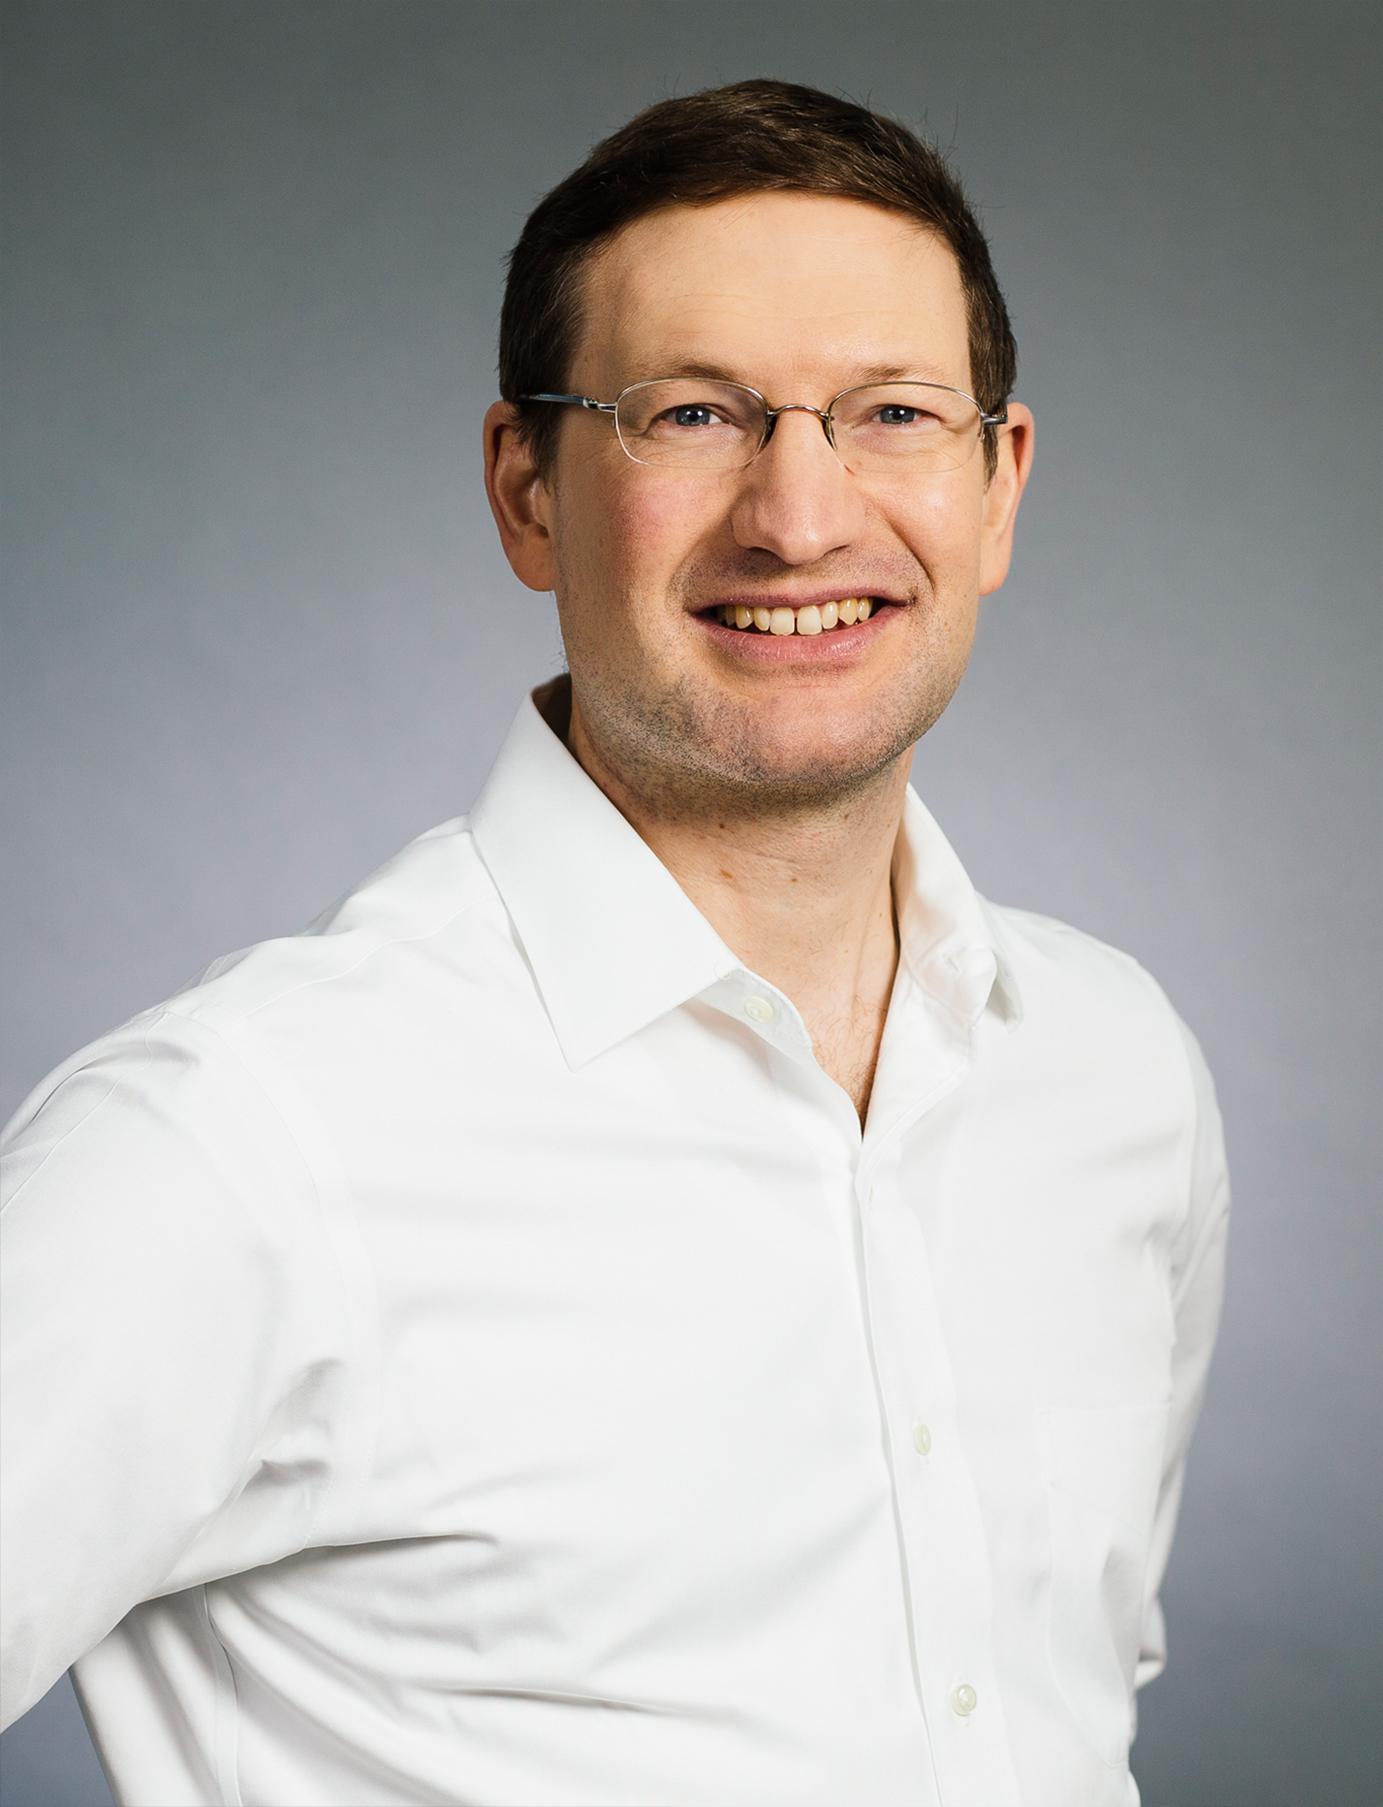 Peter Neubeck